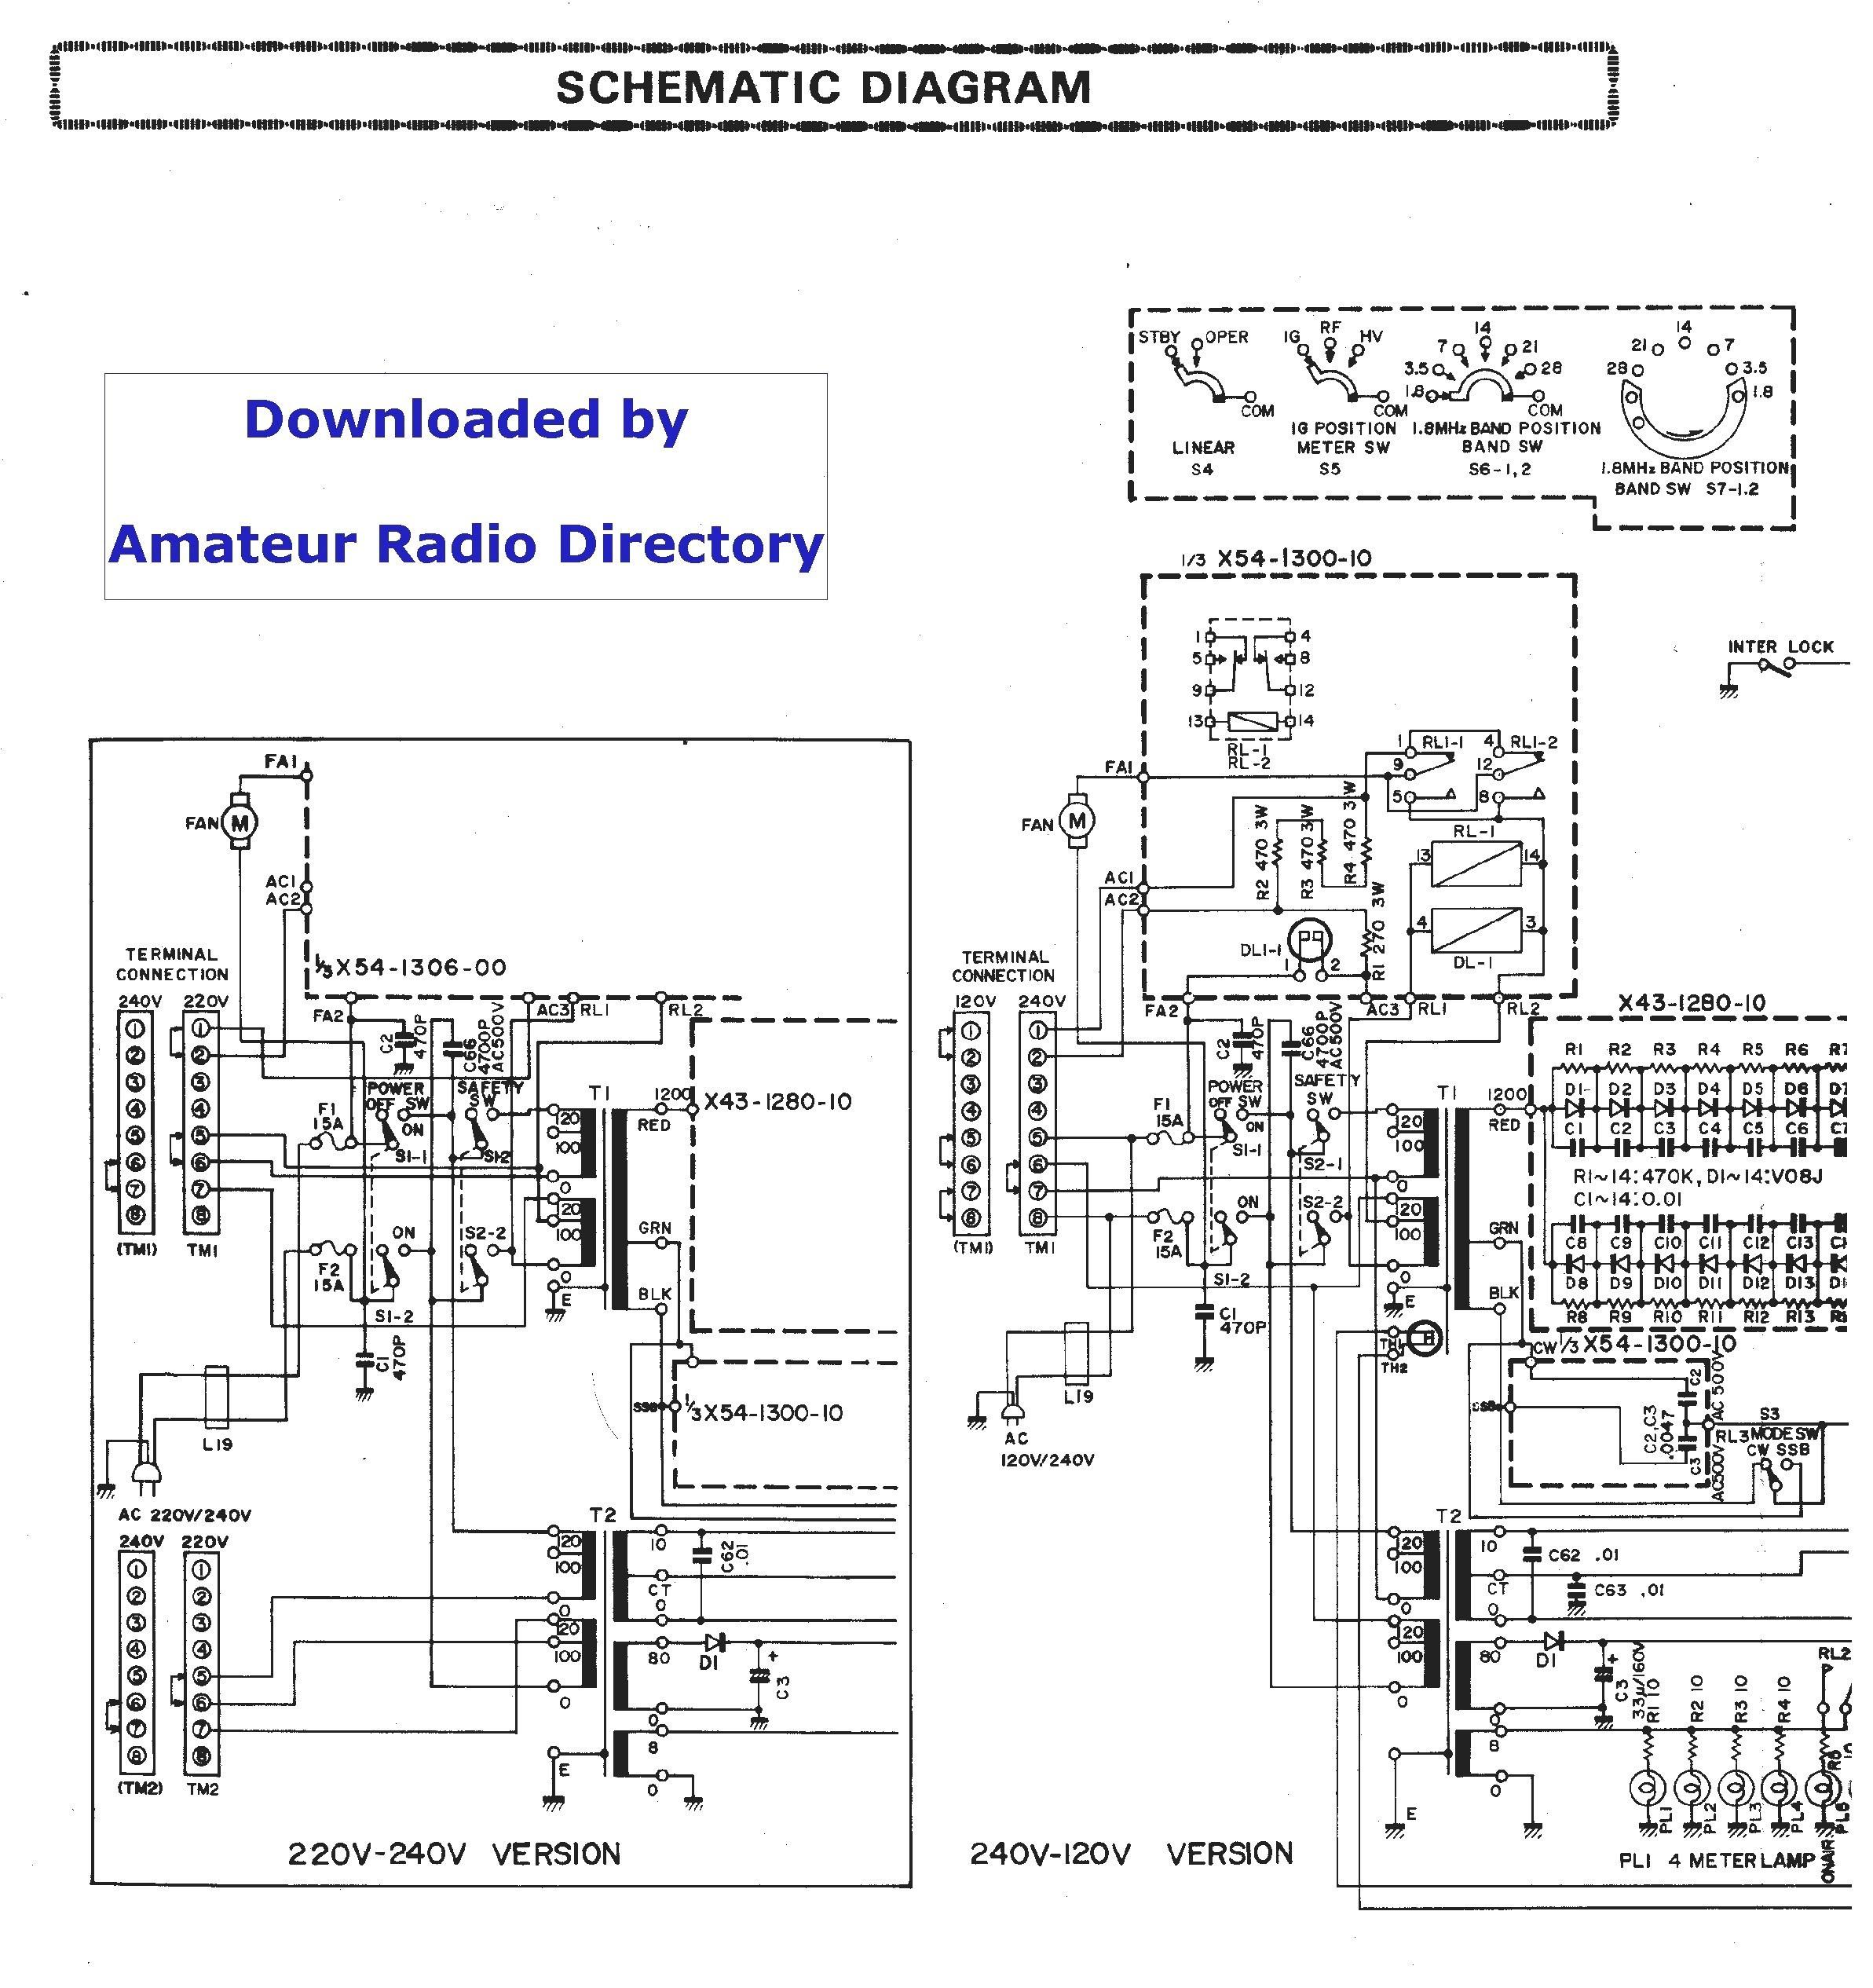 Wire Diagram Kenwood Kdc 210U | Manual E-Books - Kenwood Kdc-210U Wiring Diagram